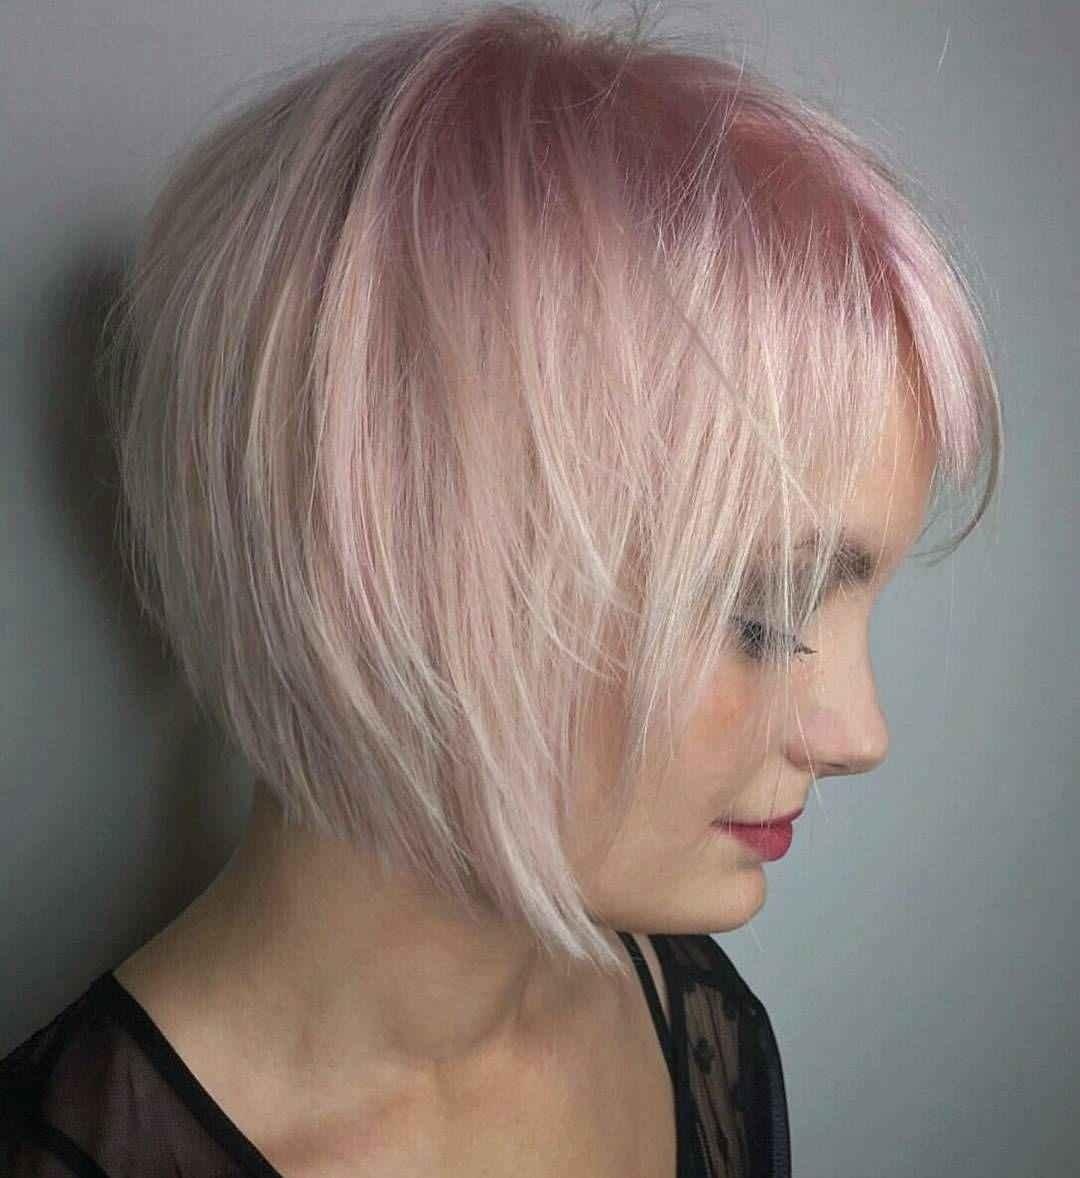 10 Elegant Short Blonde Hair Color Ideas short blonde hair color ideas elegant 10 fabulous summer hair color 2021